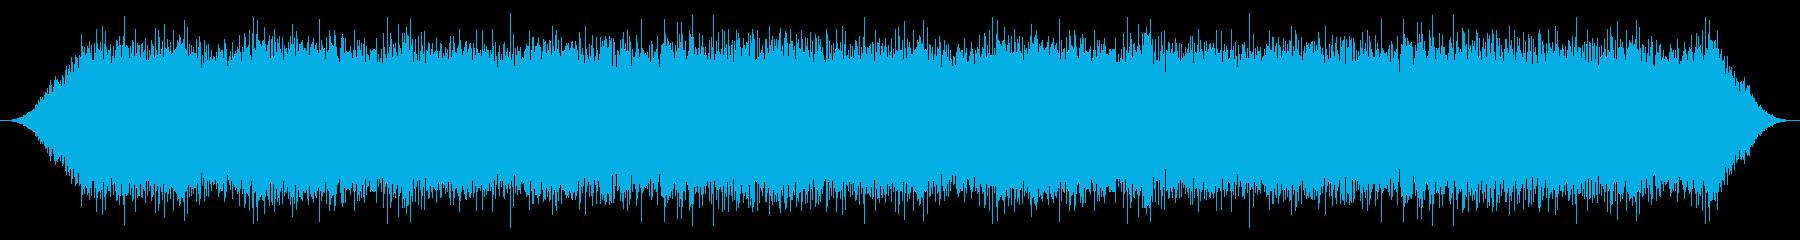 PC 駆動音03-05(ロング)の再生済みの波形